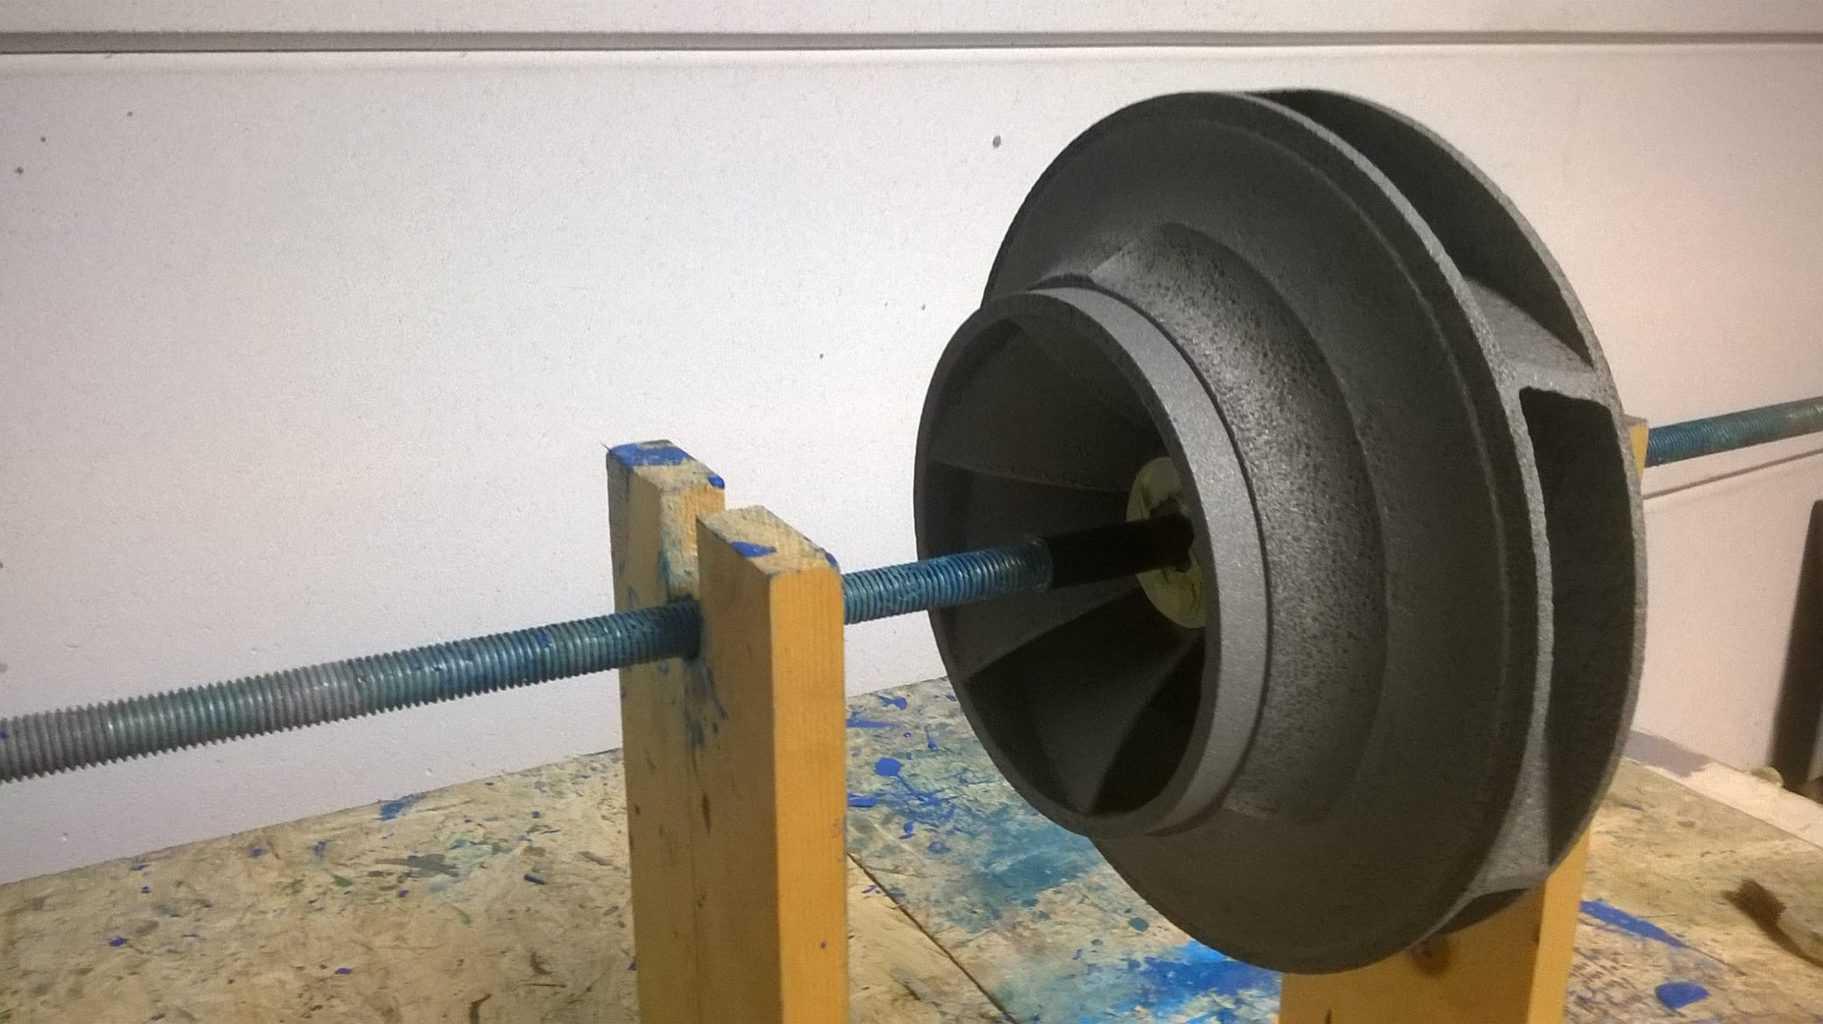 unpainted ceramic pump wheel after surface preparation